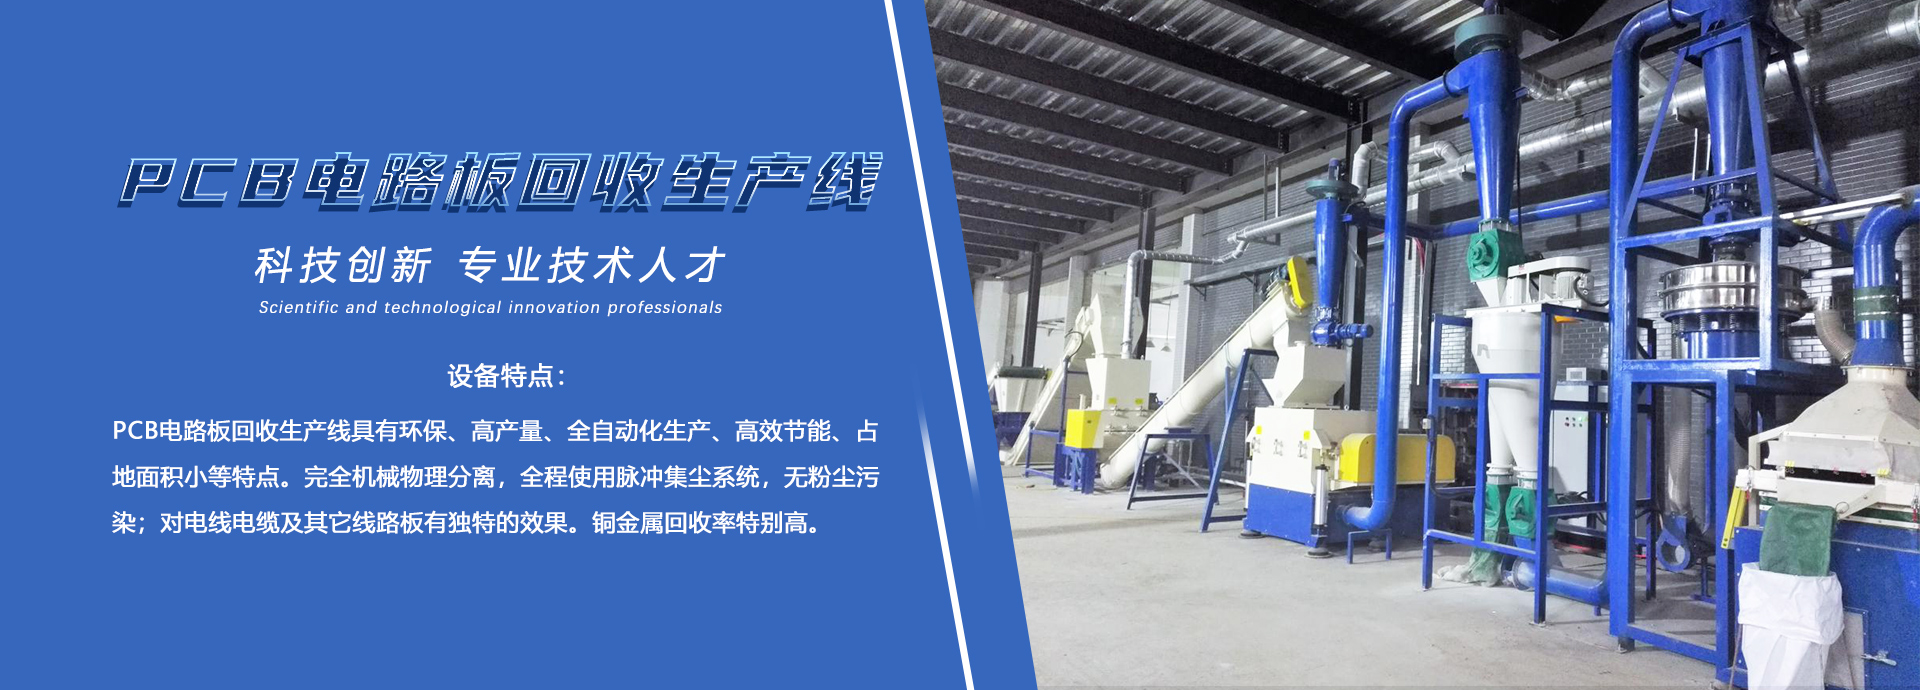 PCB电路板回收生产线